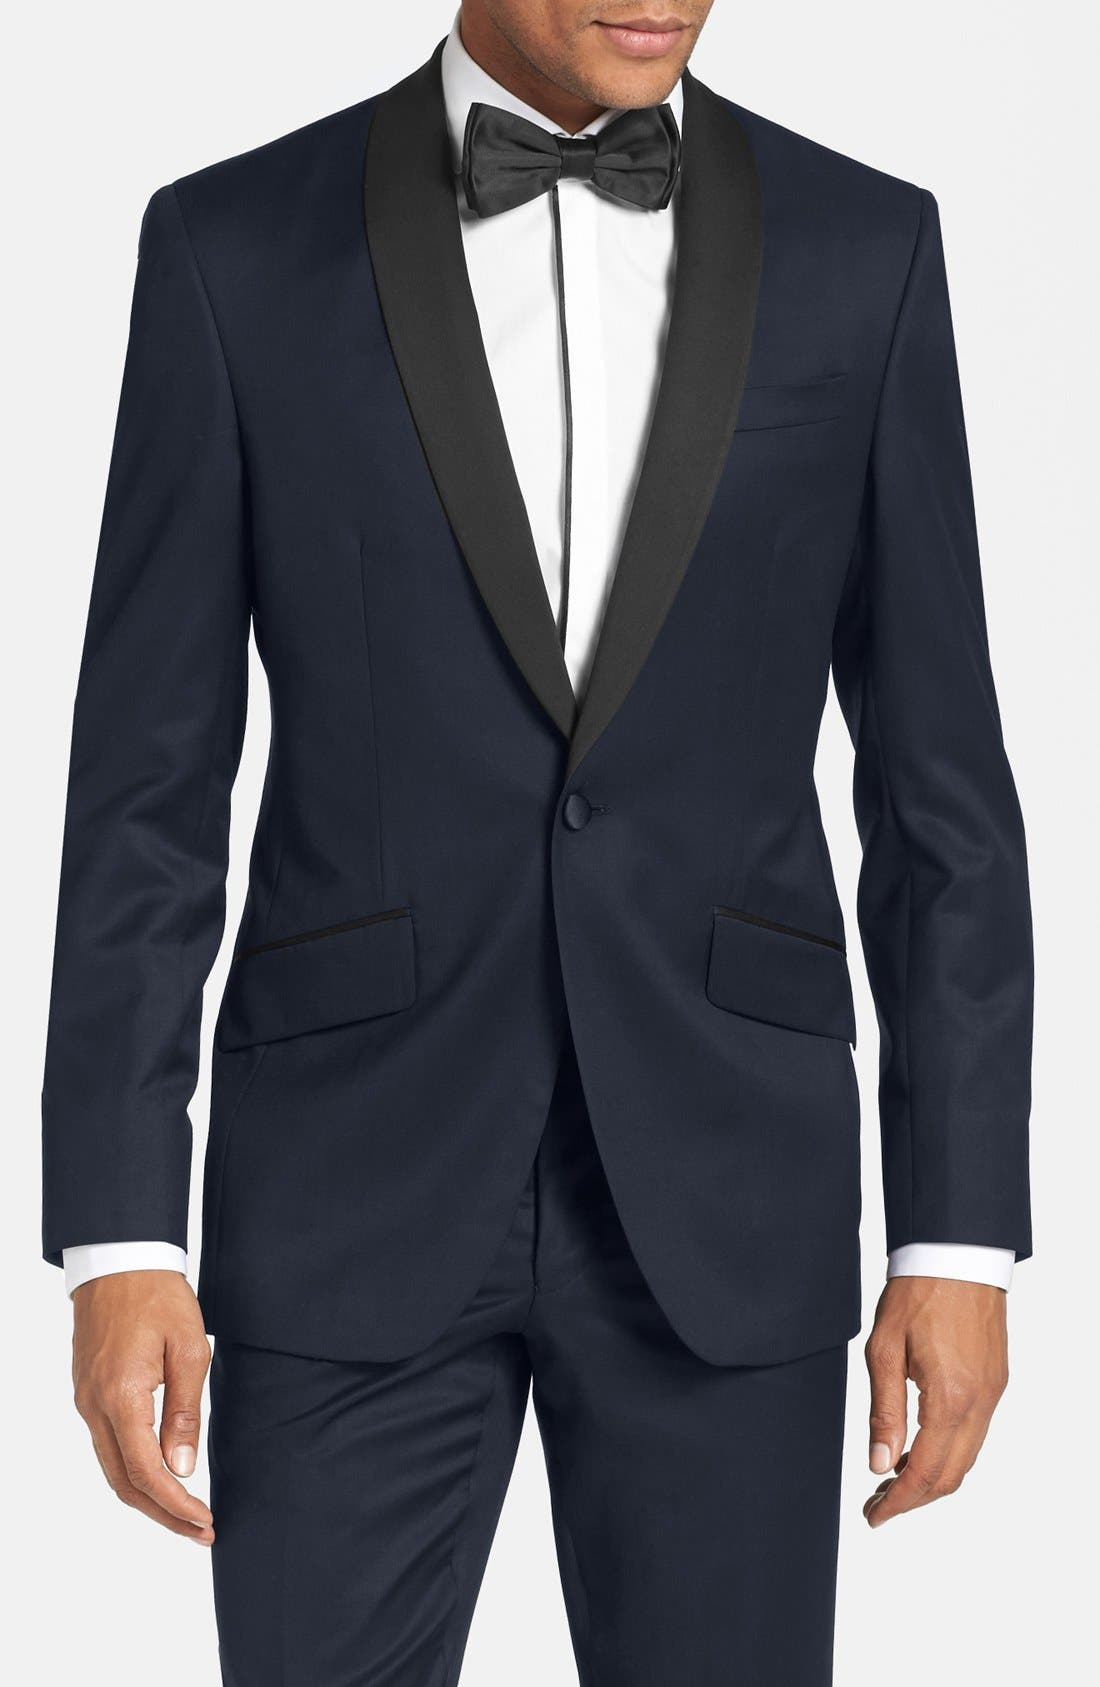 'Josh' Trim Fit Navy Shawl Lapel Tuxedo,                             Alternate thumbnail 2, color,                             NAVY BLUE